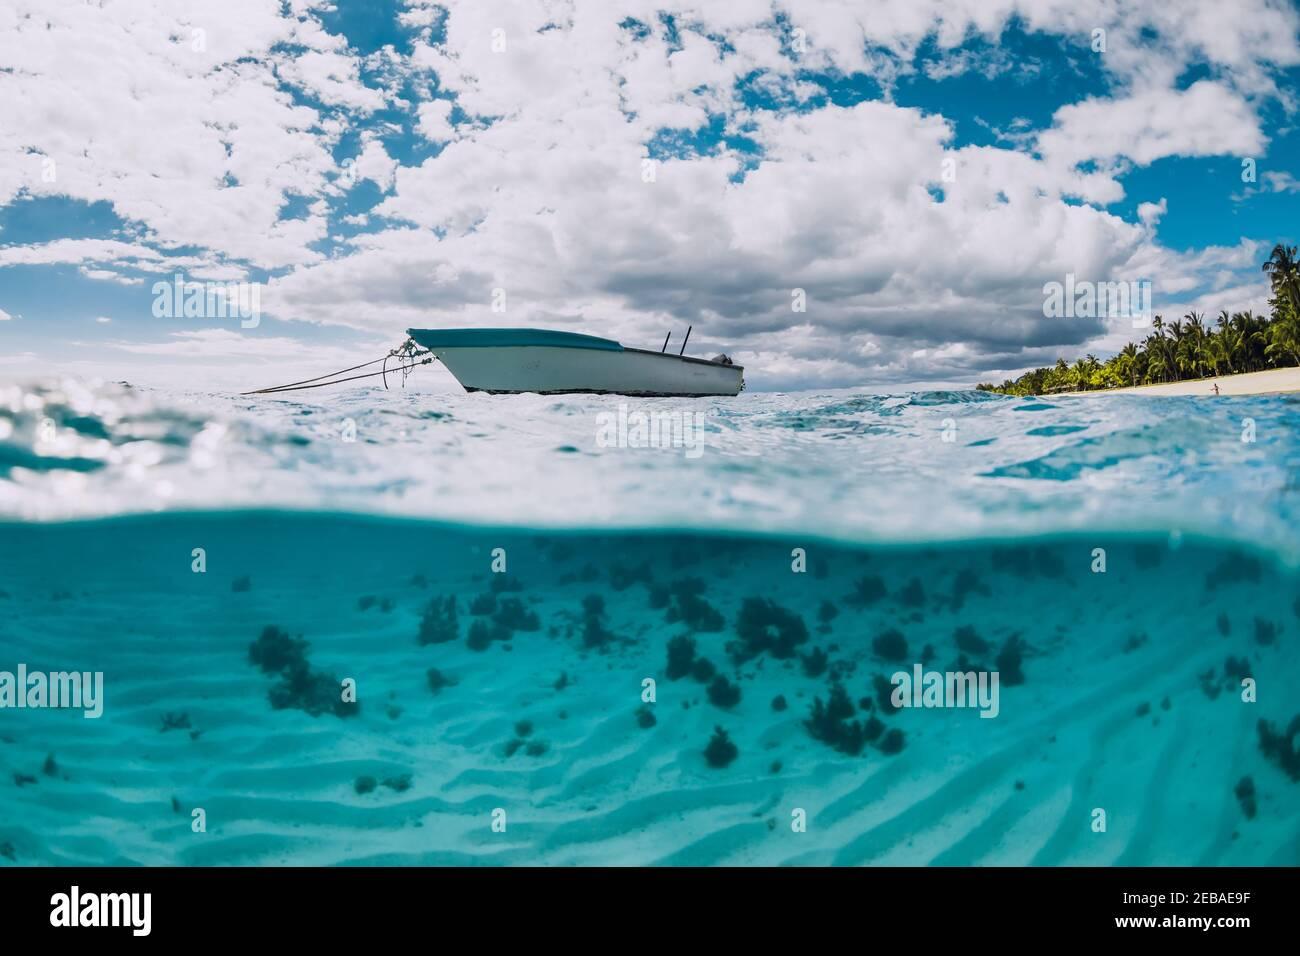 Océano tropical transparente con barco blanco en Mauricio. Vista dividida. Foto de stock